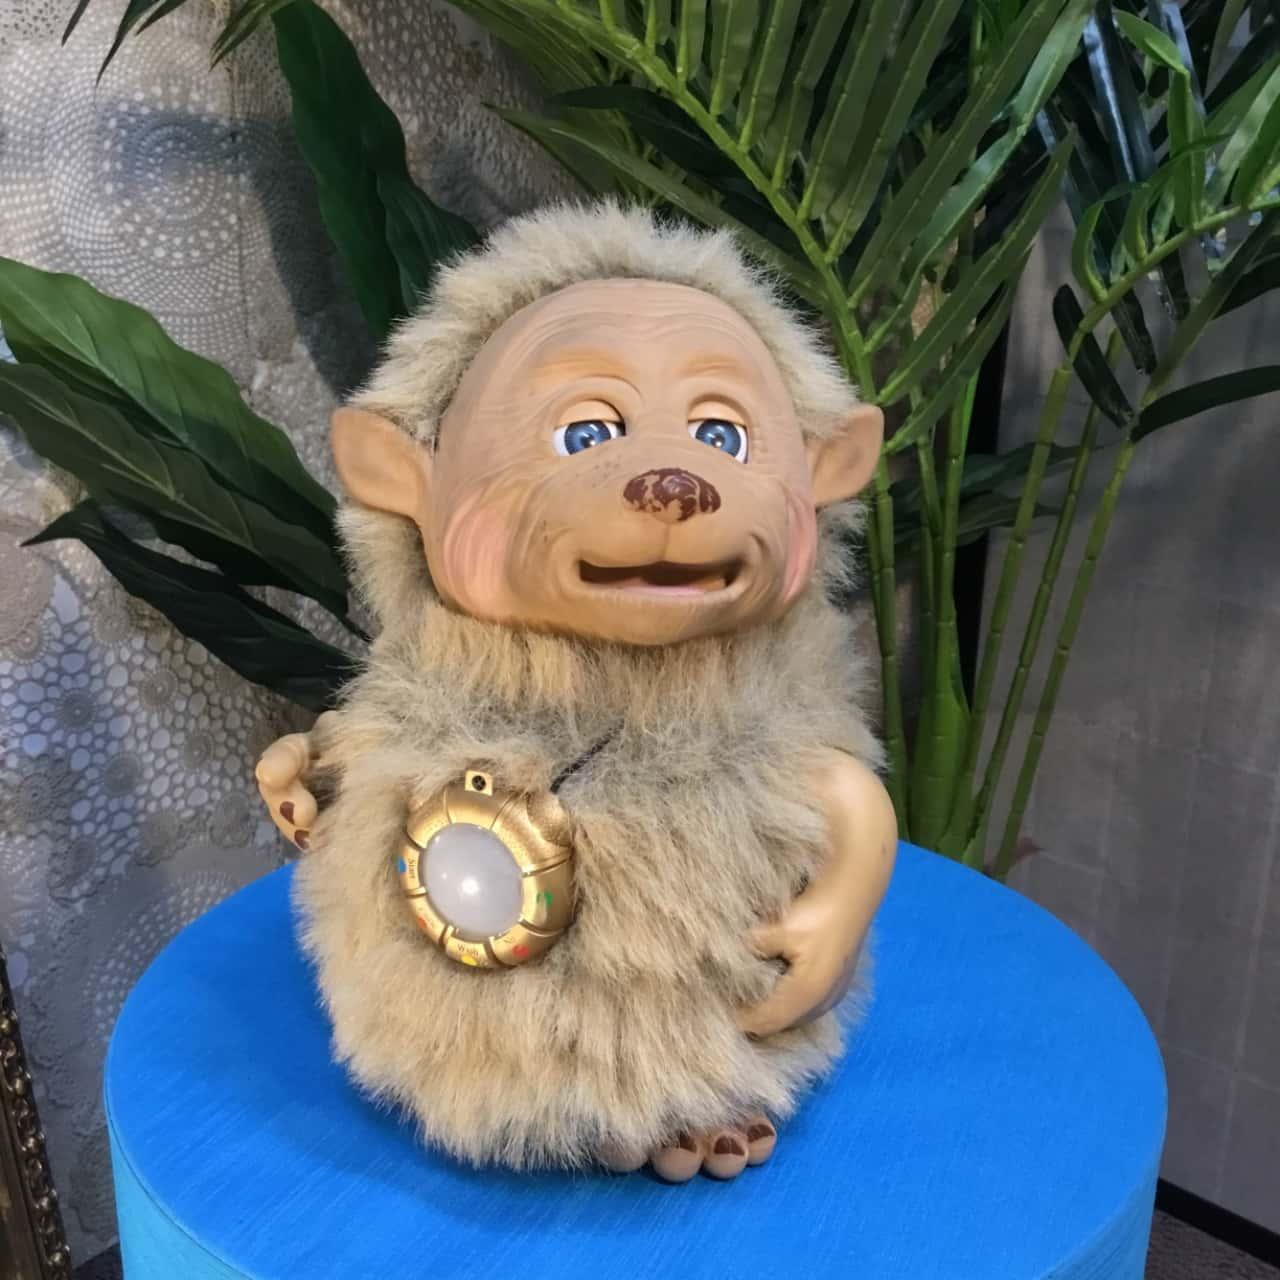 The Original San Francisco Toymaker Yano Interactive Storyteller